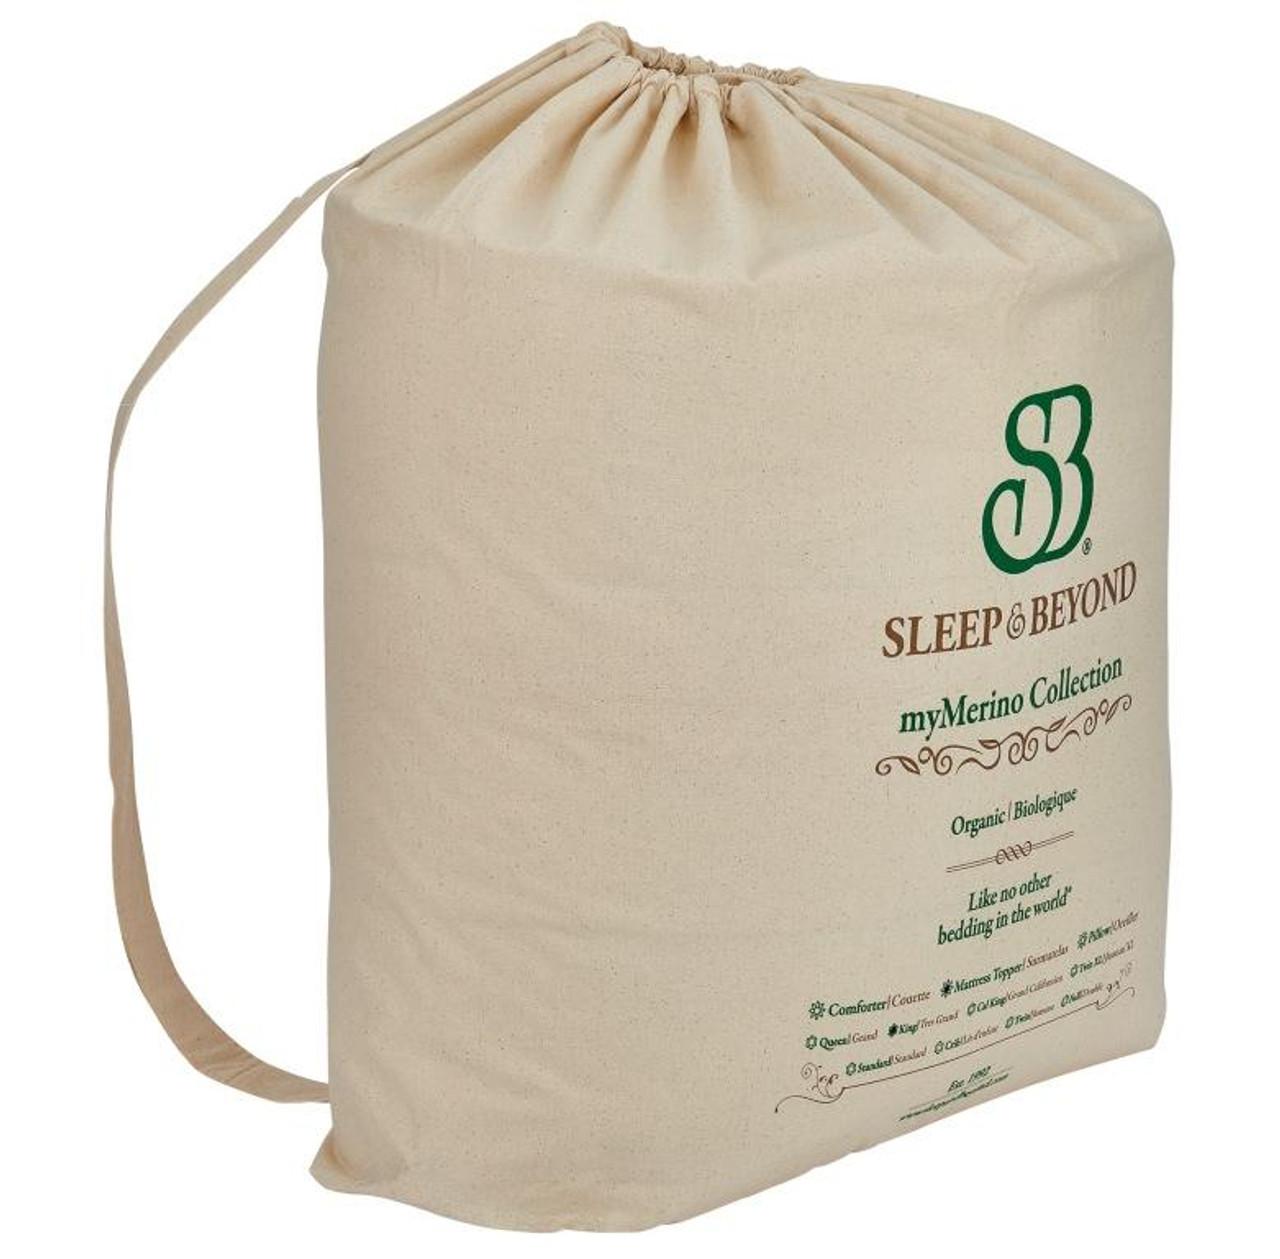 Sleep & Beyond myMerino™ Comforter, Organic Merino Wool Comforter Outer Packaging #2